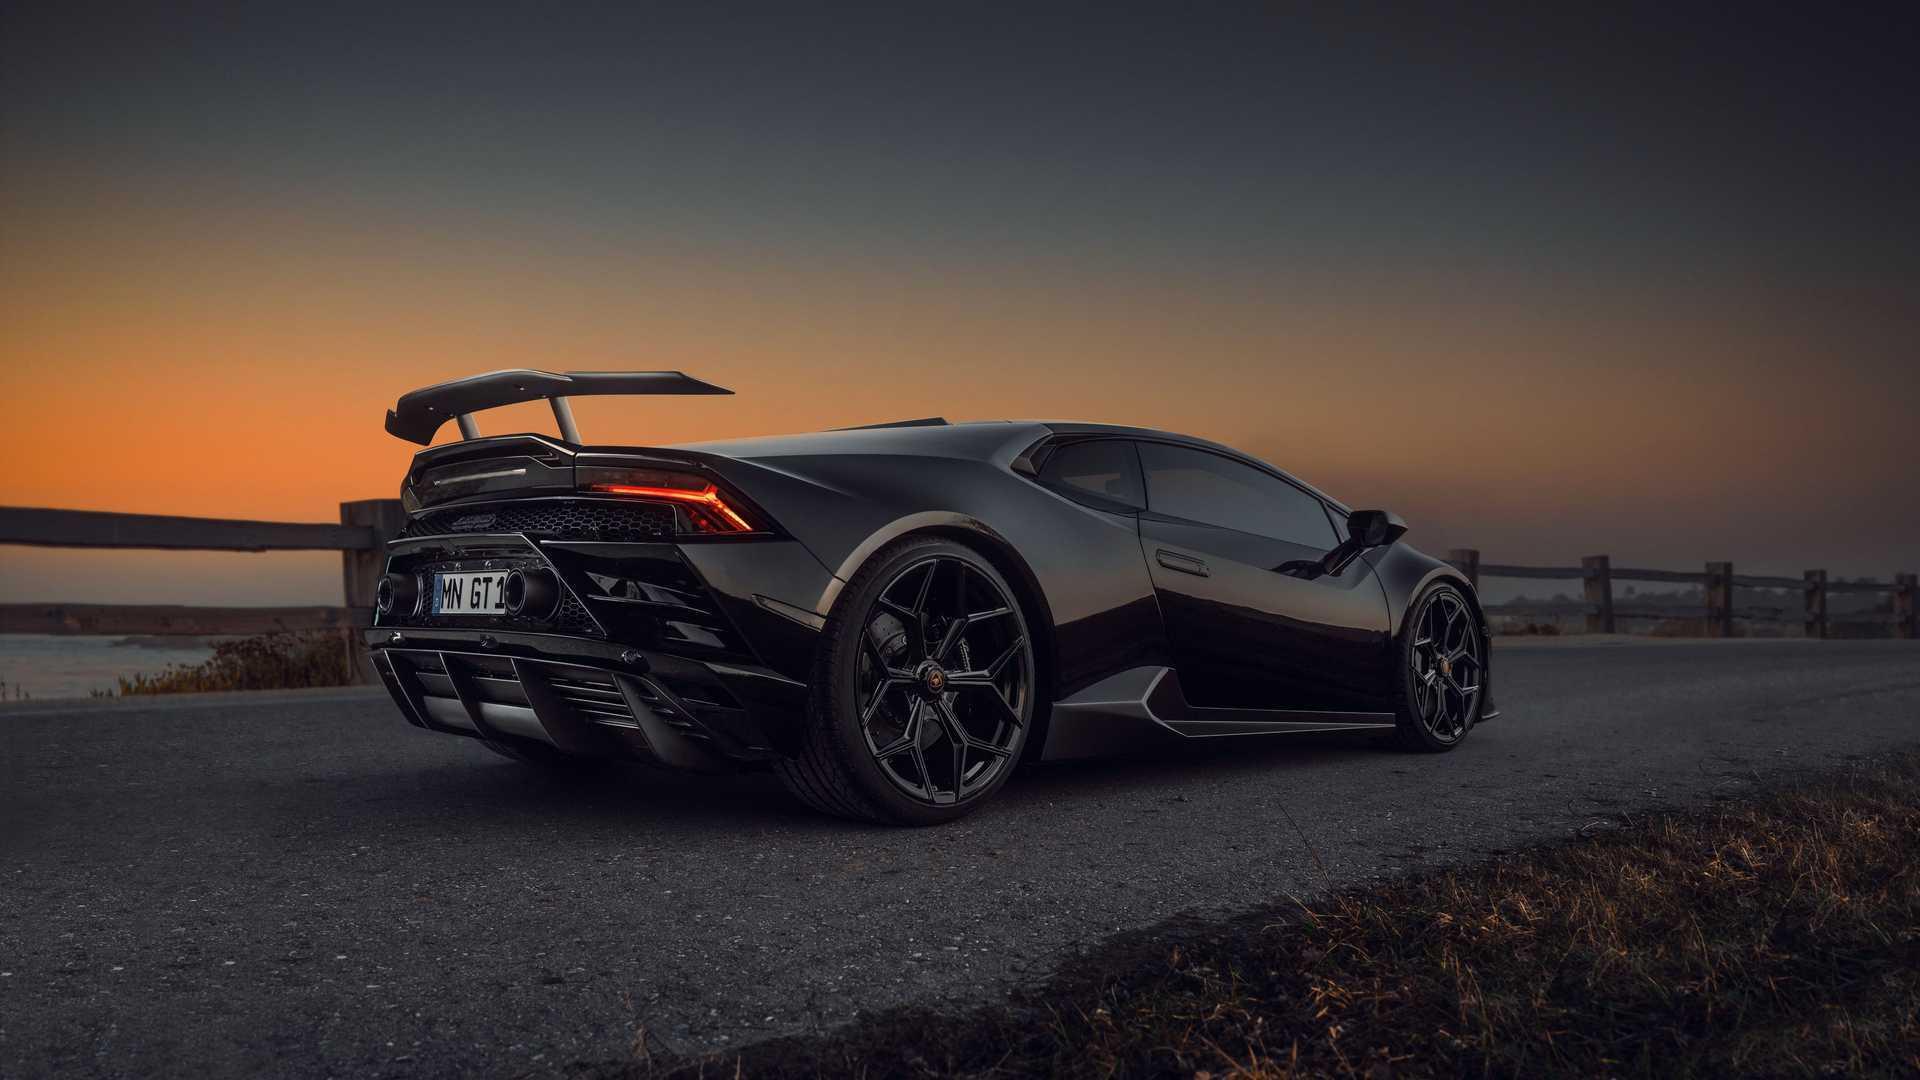 Lamborghini Huracan Evo By Novitec Side View